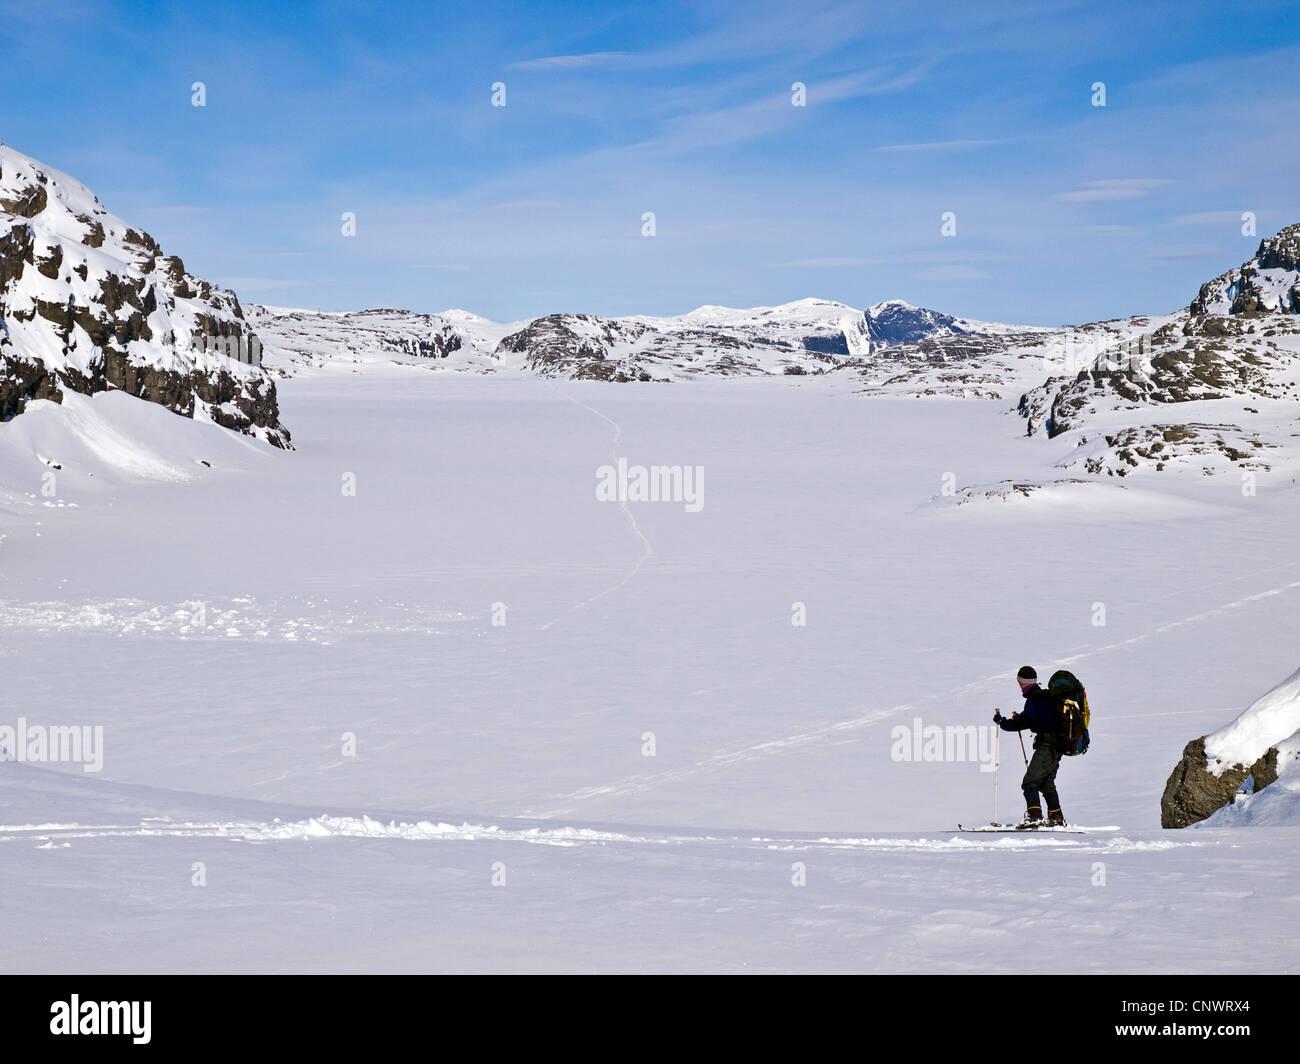 Male skier ski touring in Norway's Hardanger region - Stock Image